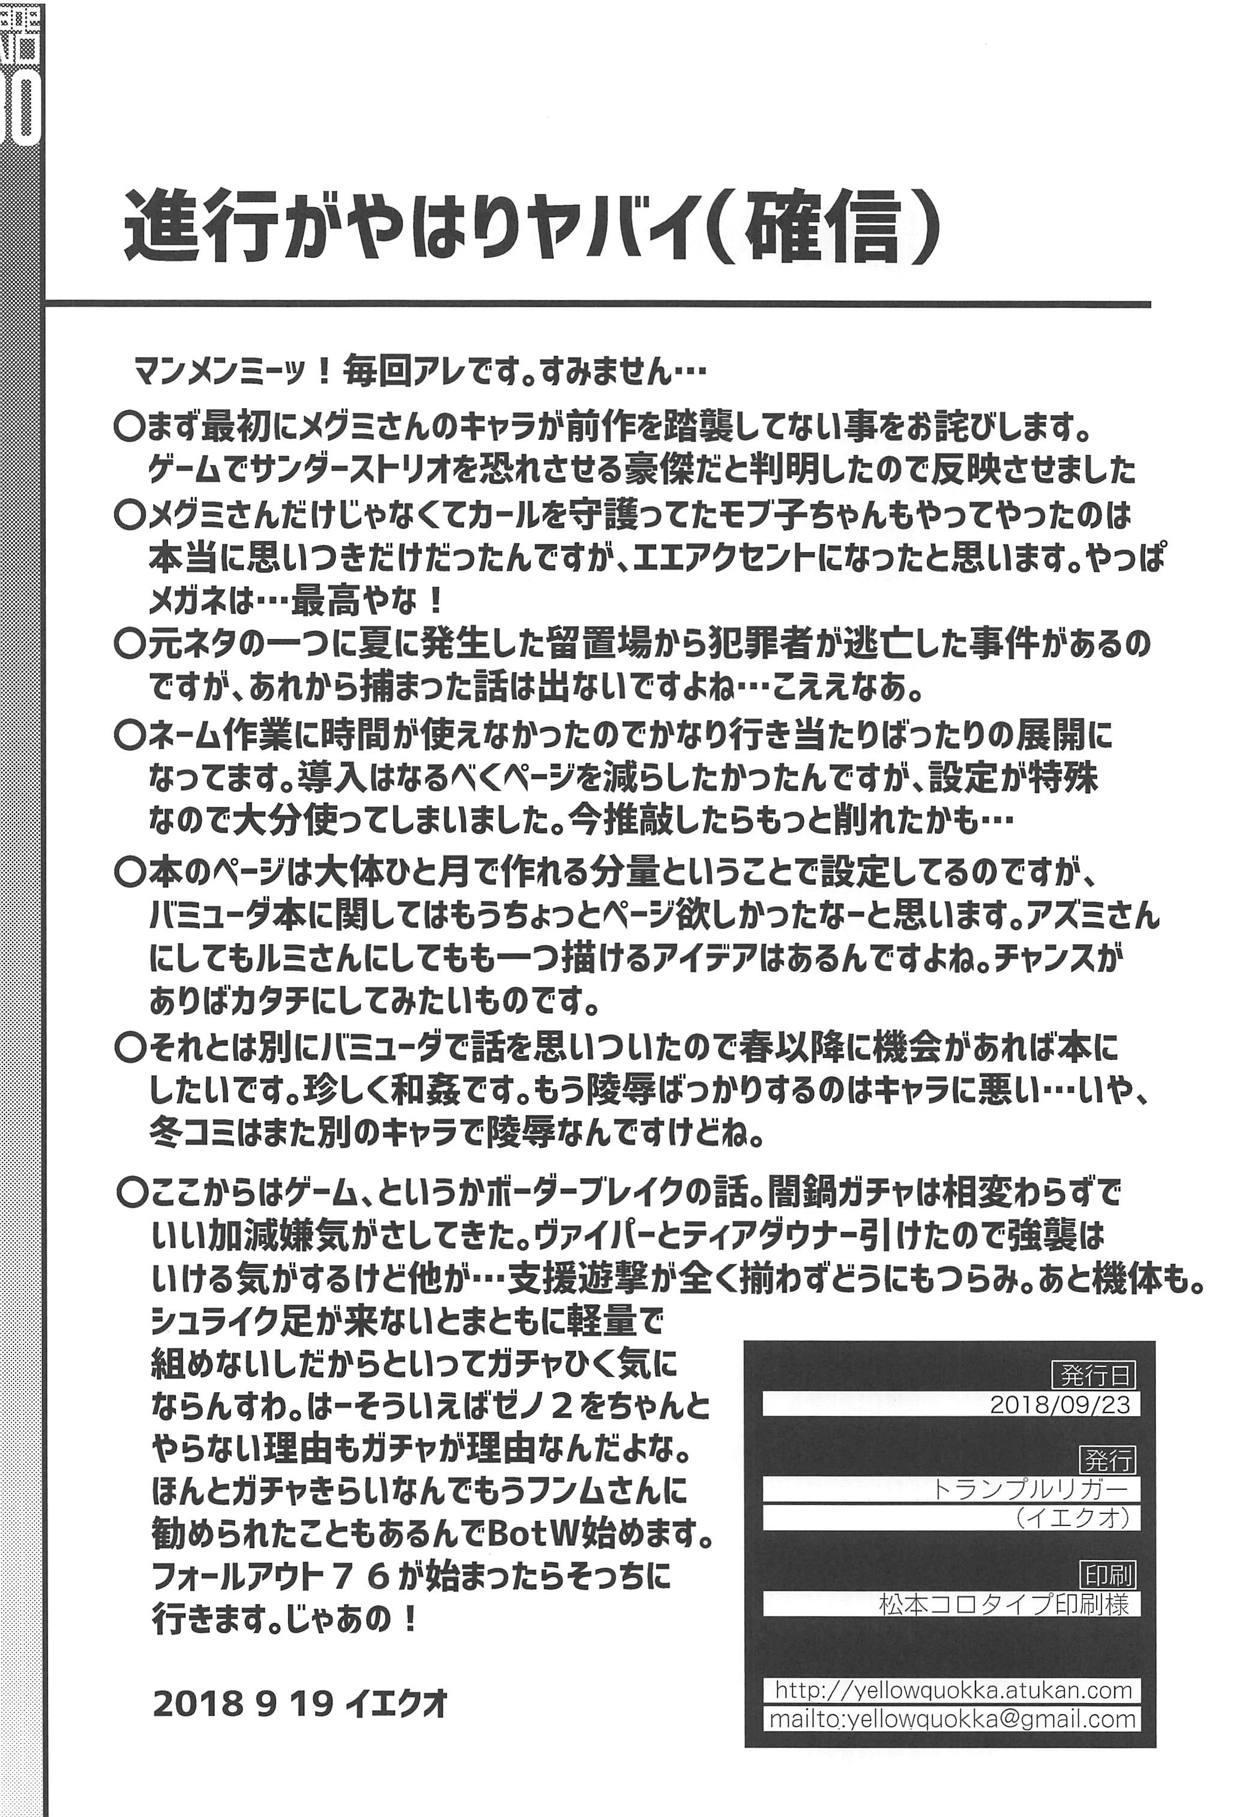 (Panzer Vor! 18) [Trample Rigger (Yequo)] Zoku [Me-gata] Avenger Shoushitsu Jiken (Girls und Panzer) 28